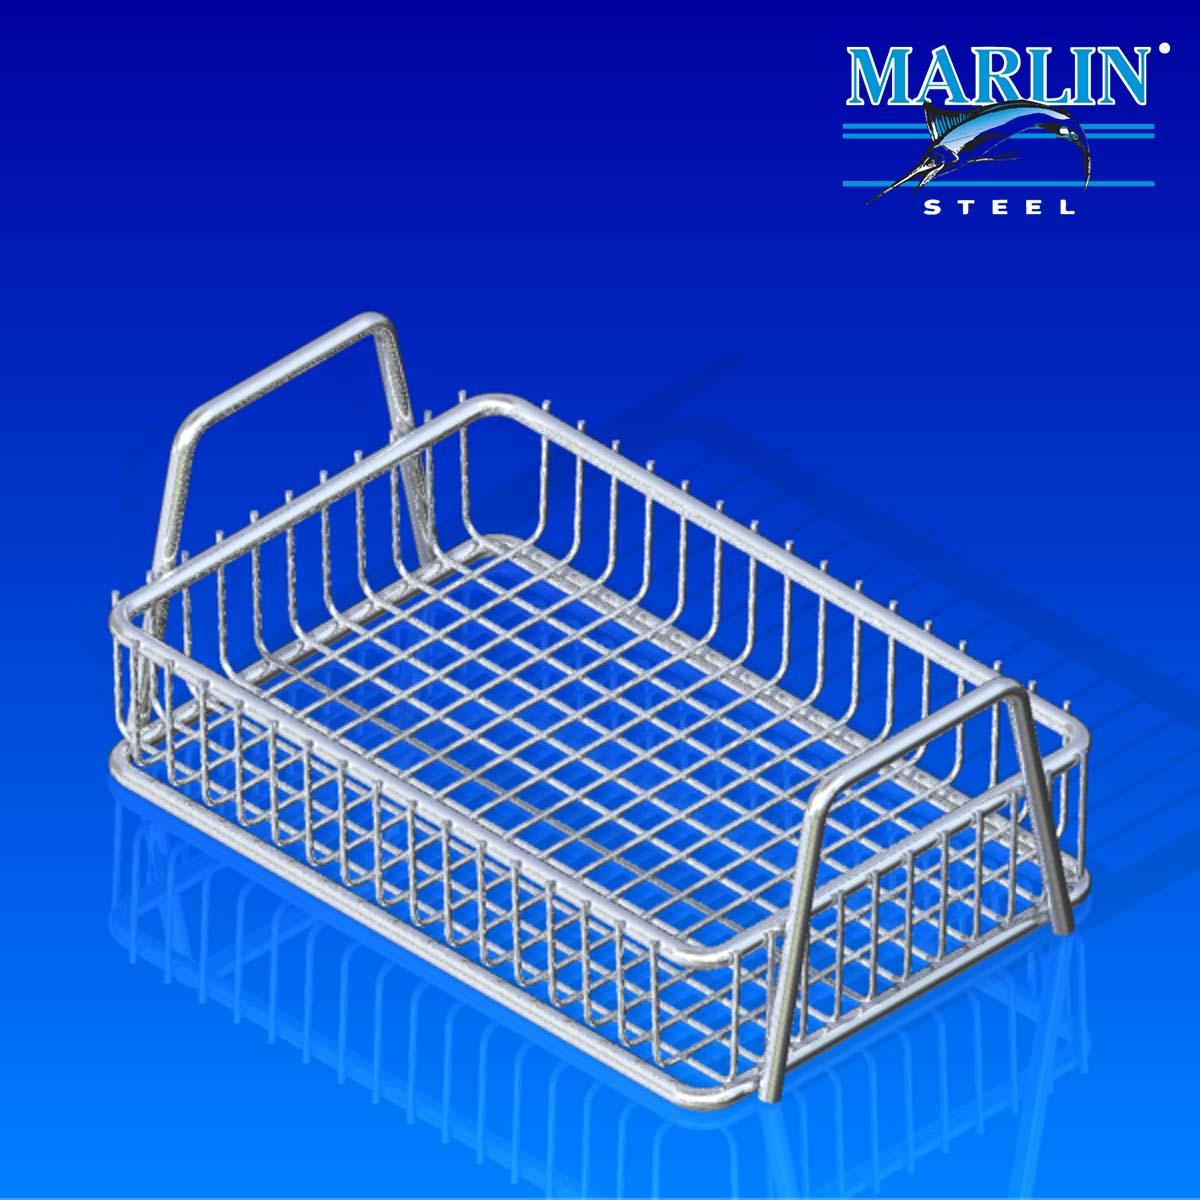 Marlin Steel Basket with Handles 186001